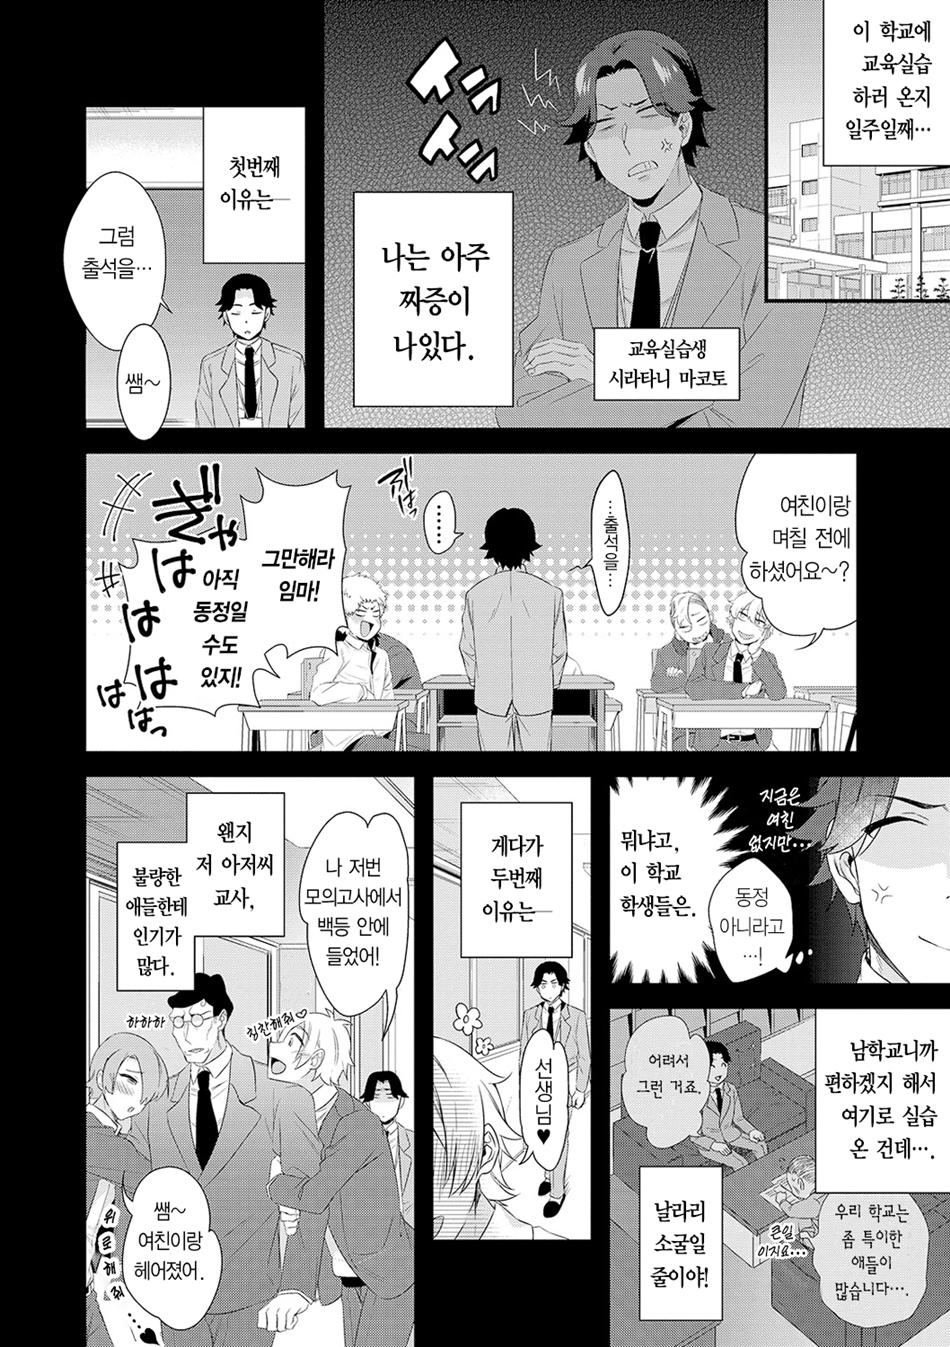 020_page_20_1.jpg